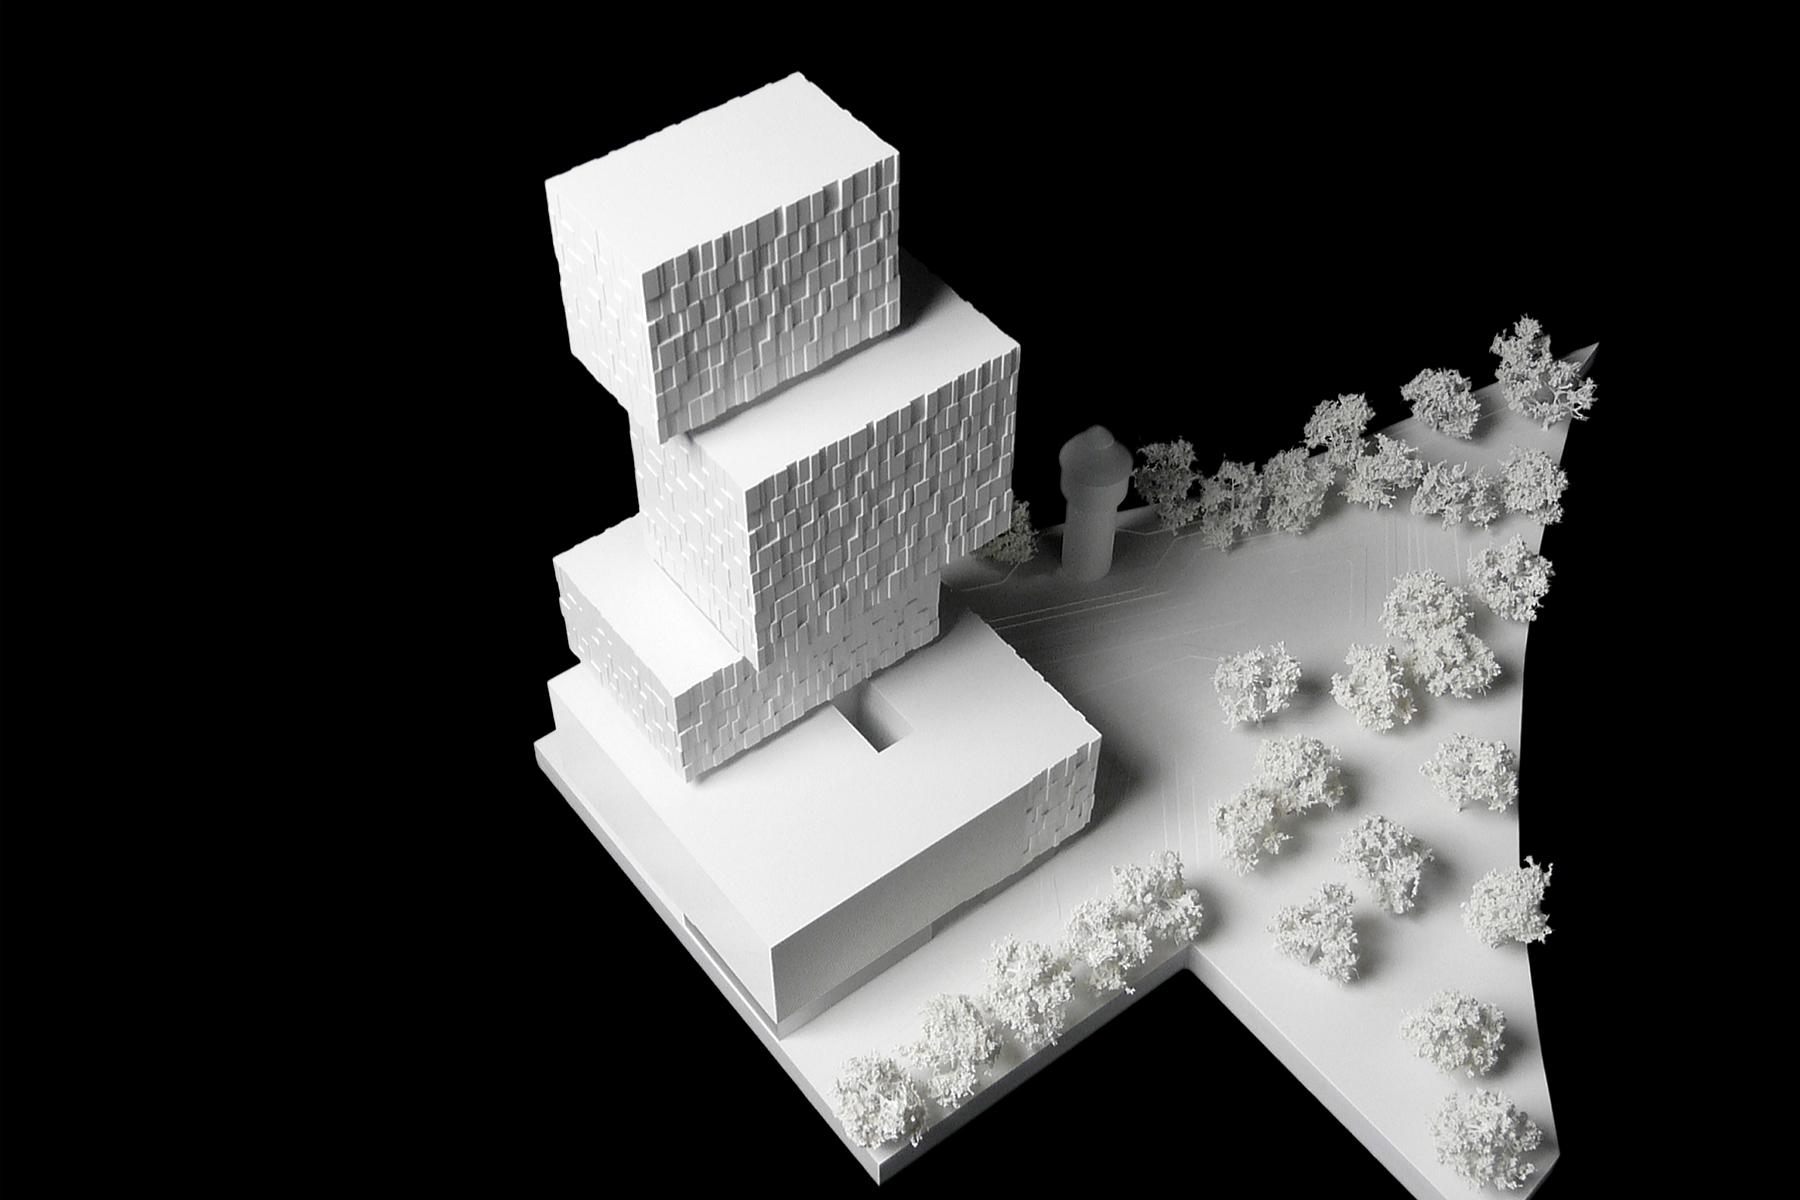 architekturmodell porsche design tower b la berec. Black Bedroom Furniture Sets. Home Design Ideas